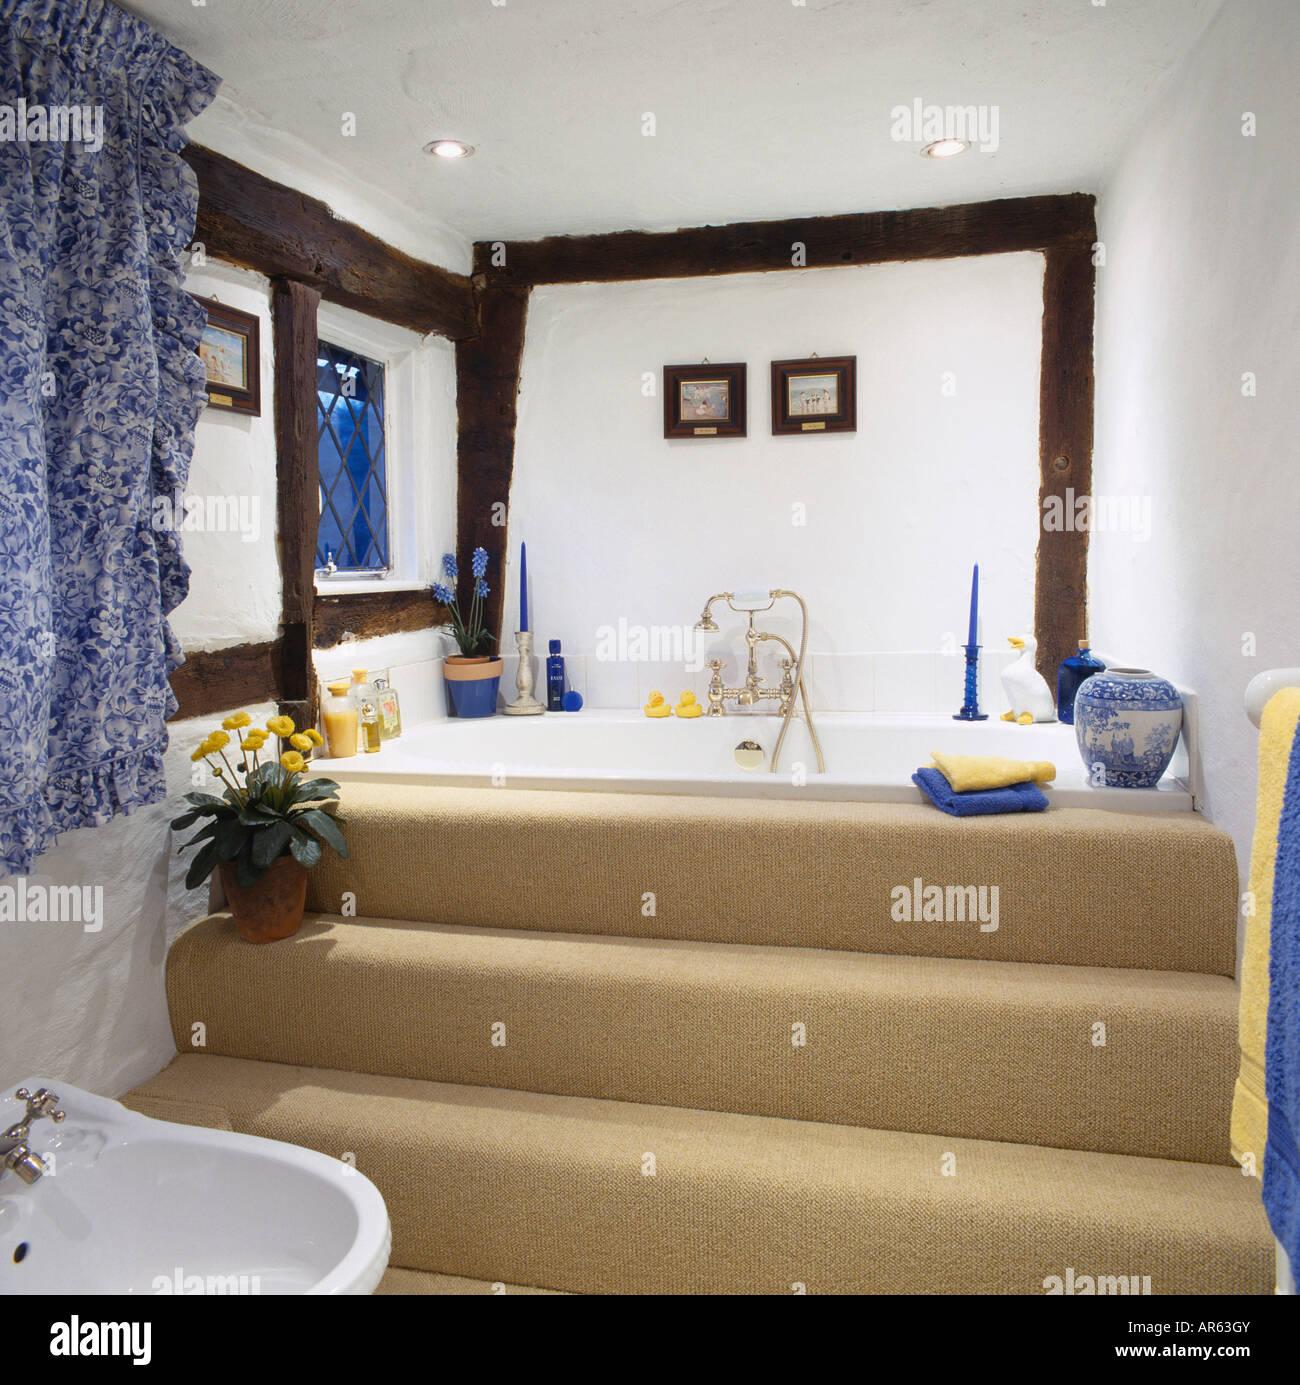 Inspiring Bathroom Steps Images - Best Ideas Exterior - oneconf.us